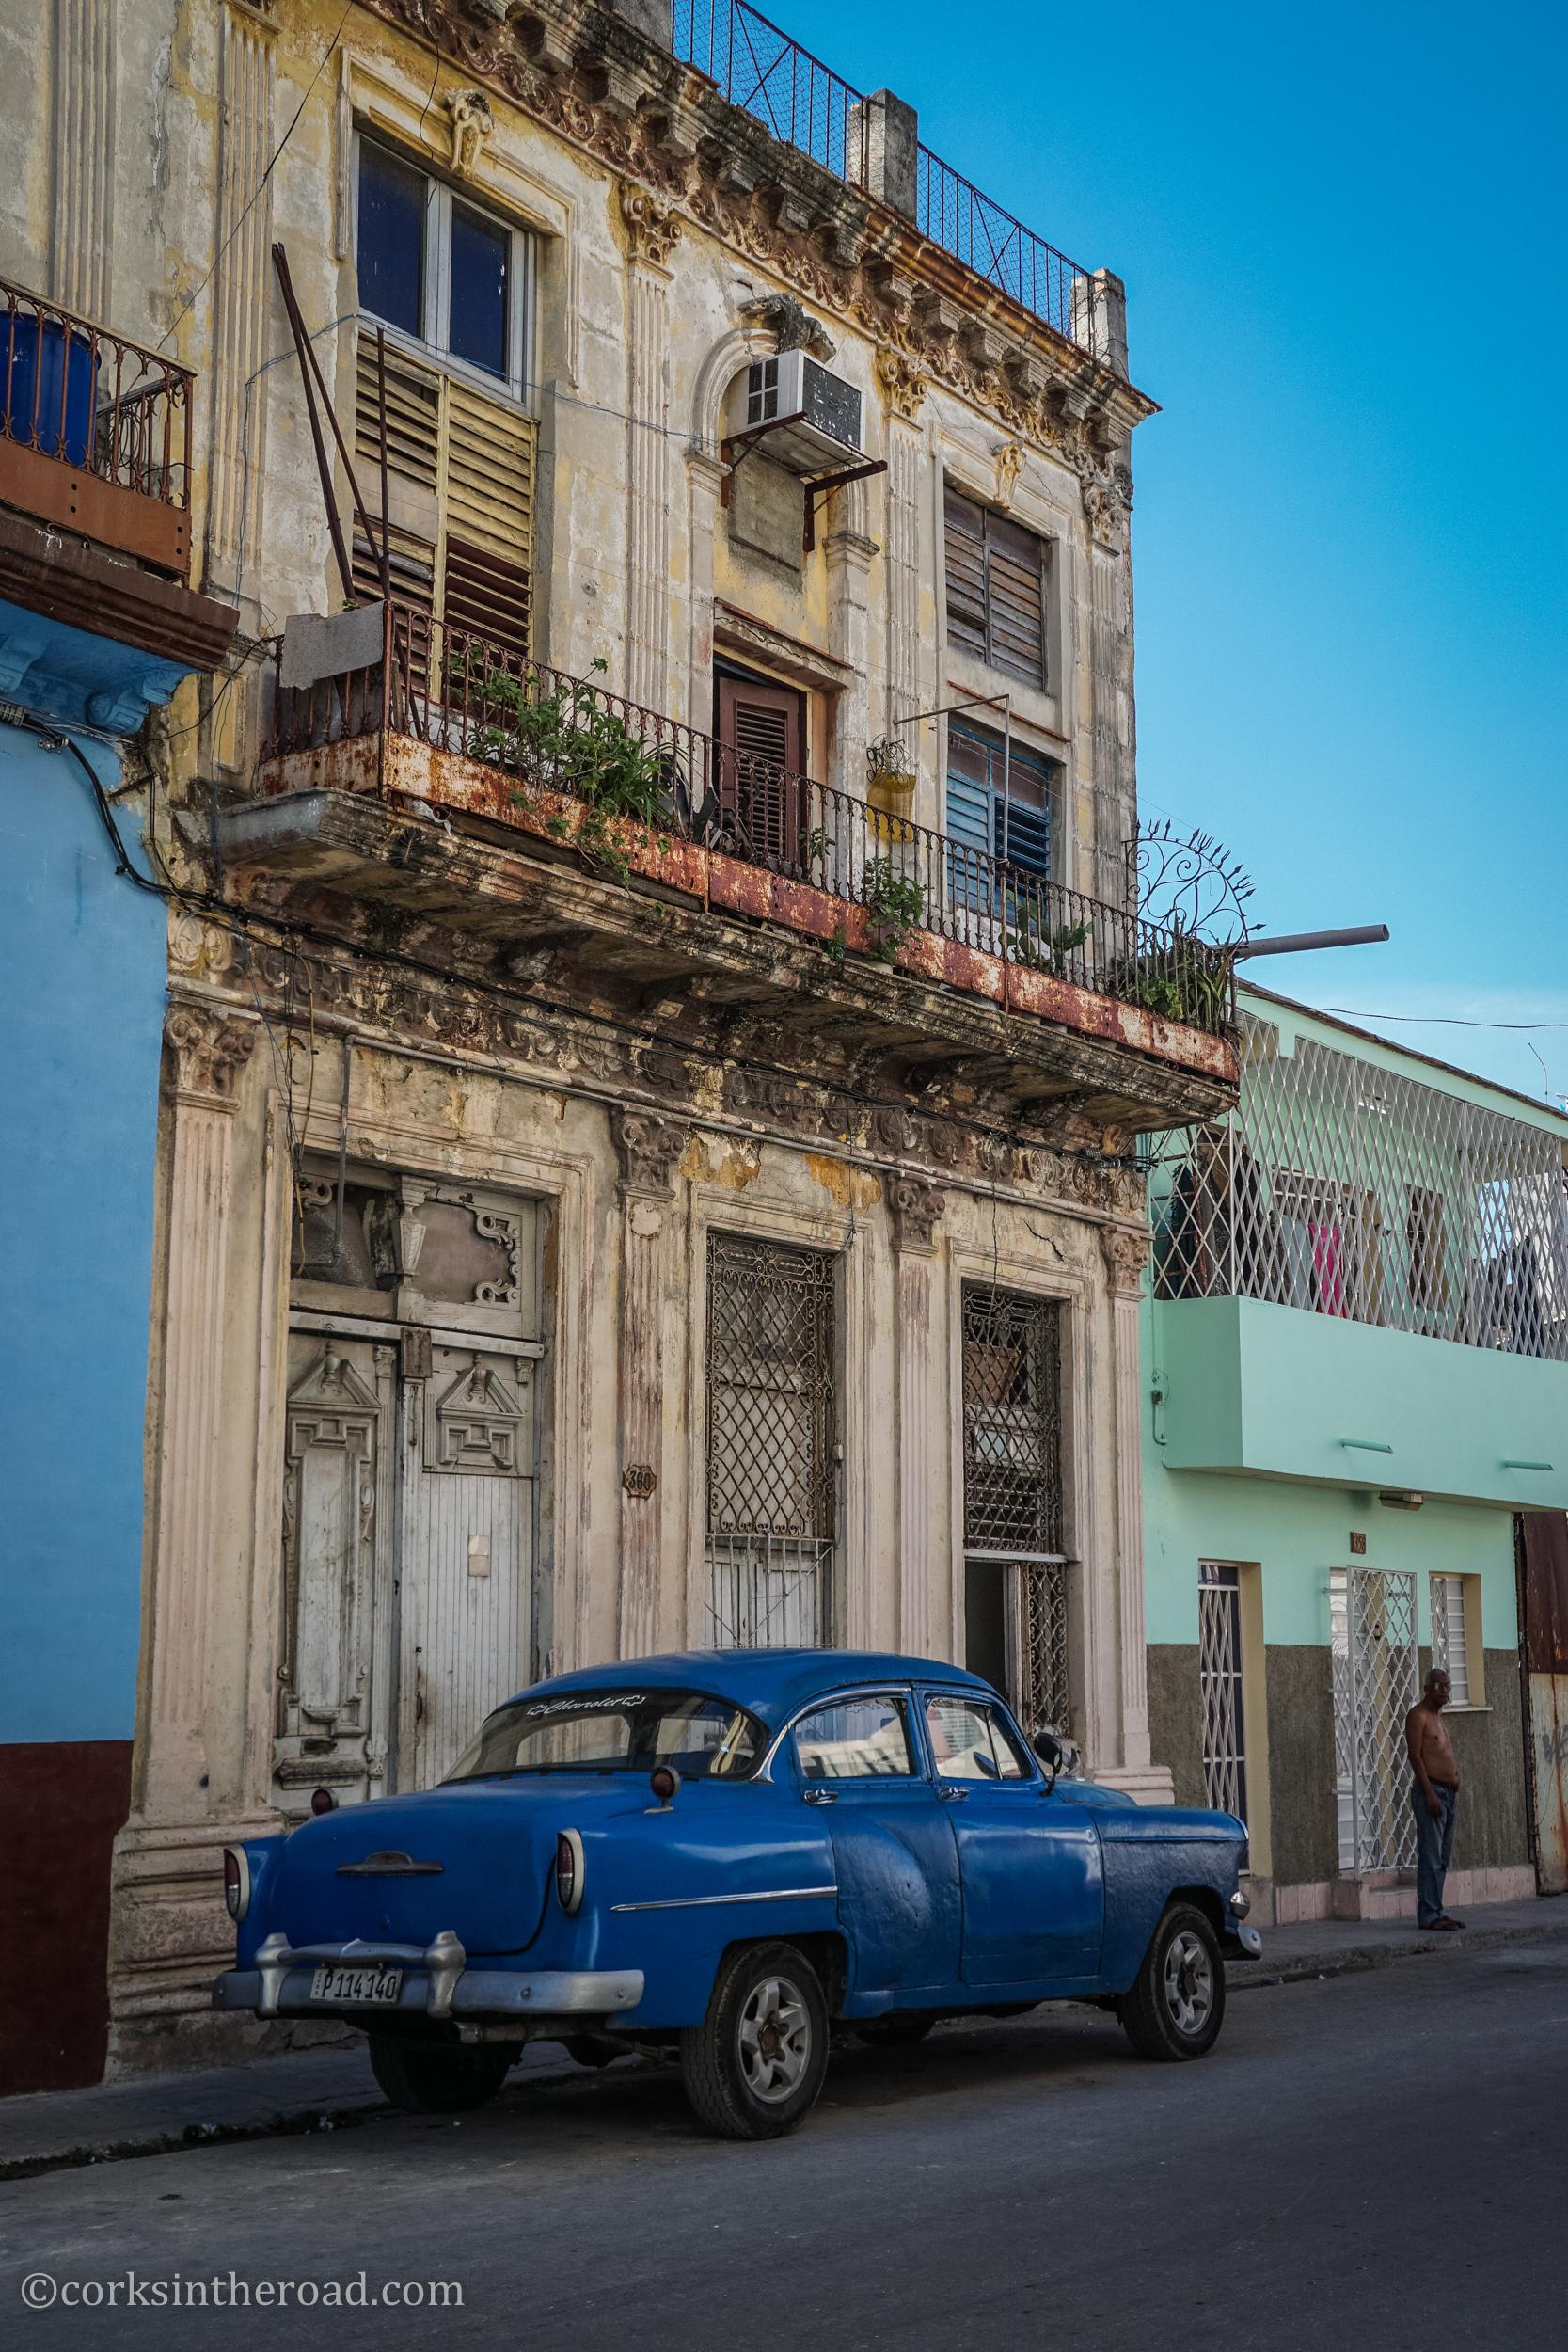 Architecture, Corksintheroad, Cuba, Havana-11.jpg